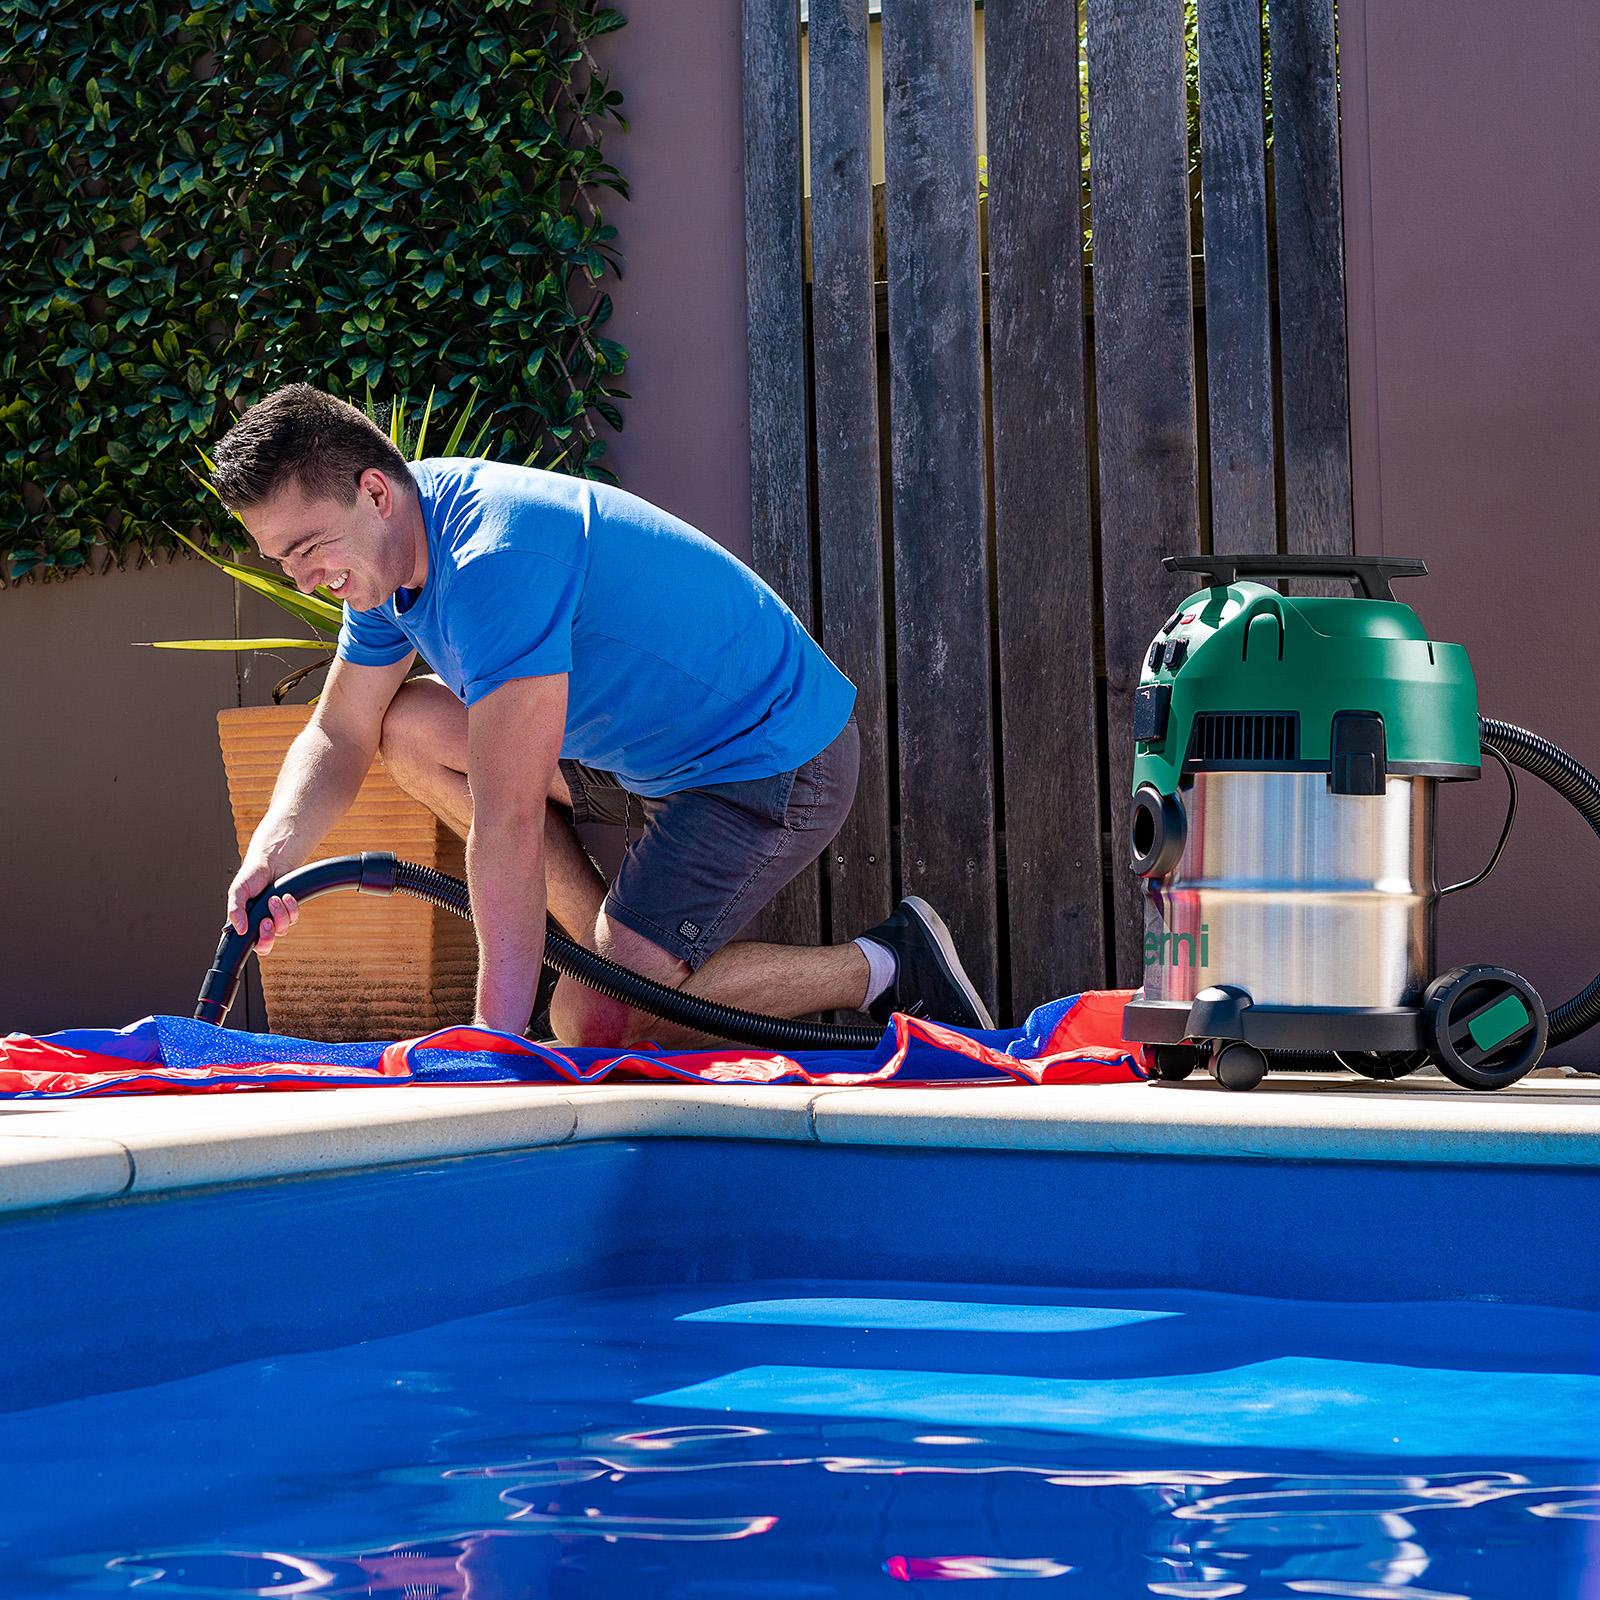 Gerni 9000 - Vacuum Blower Function - Inflate Pool Toy